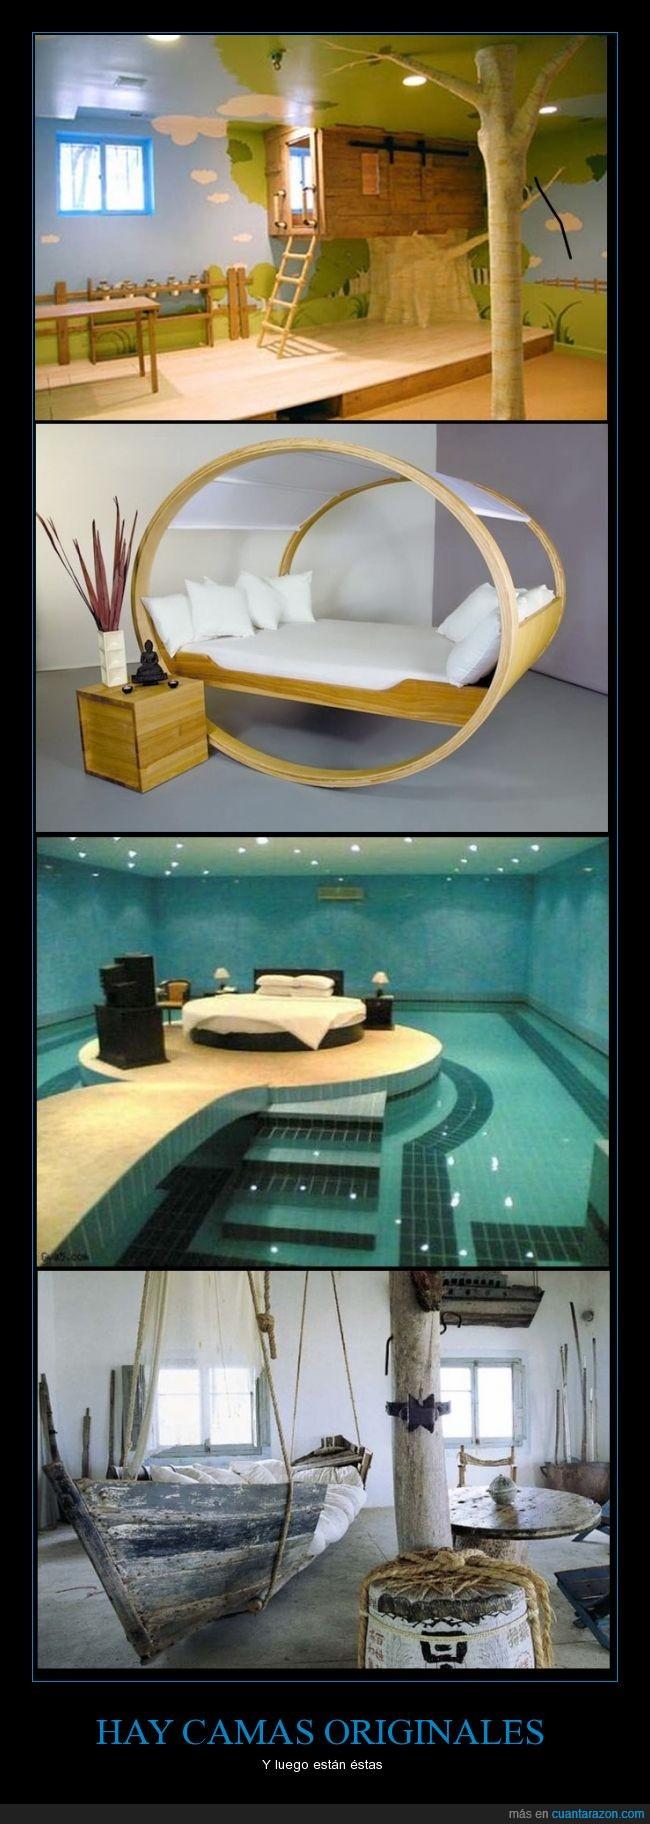 barco pirata,cama del árbol,cama mecedora,camas,originales,piscina